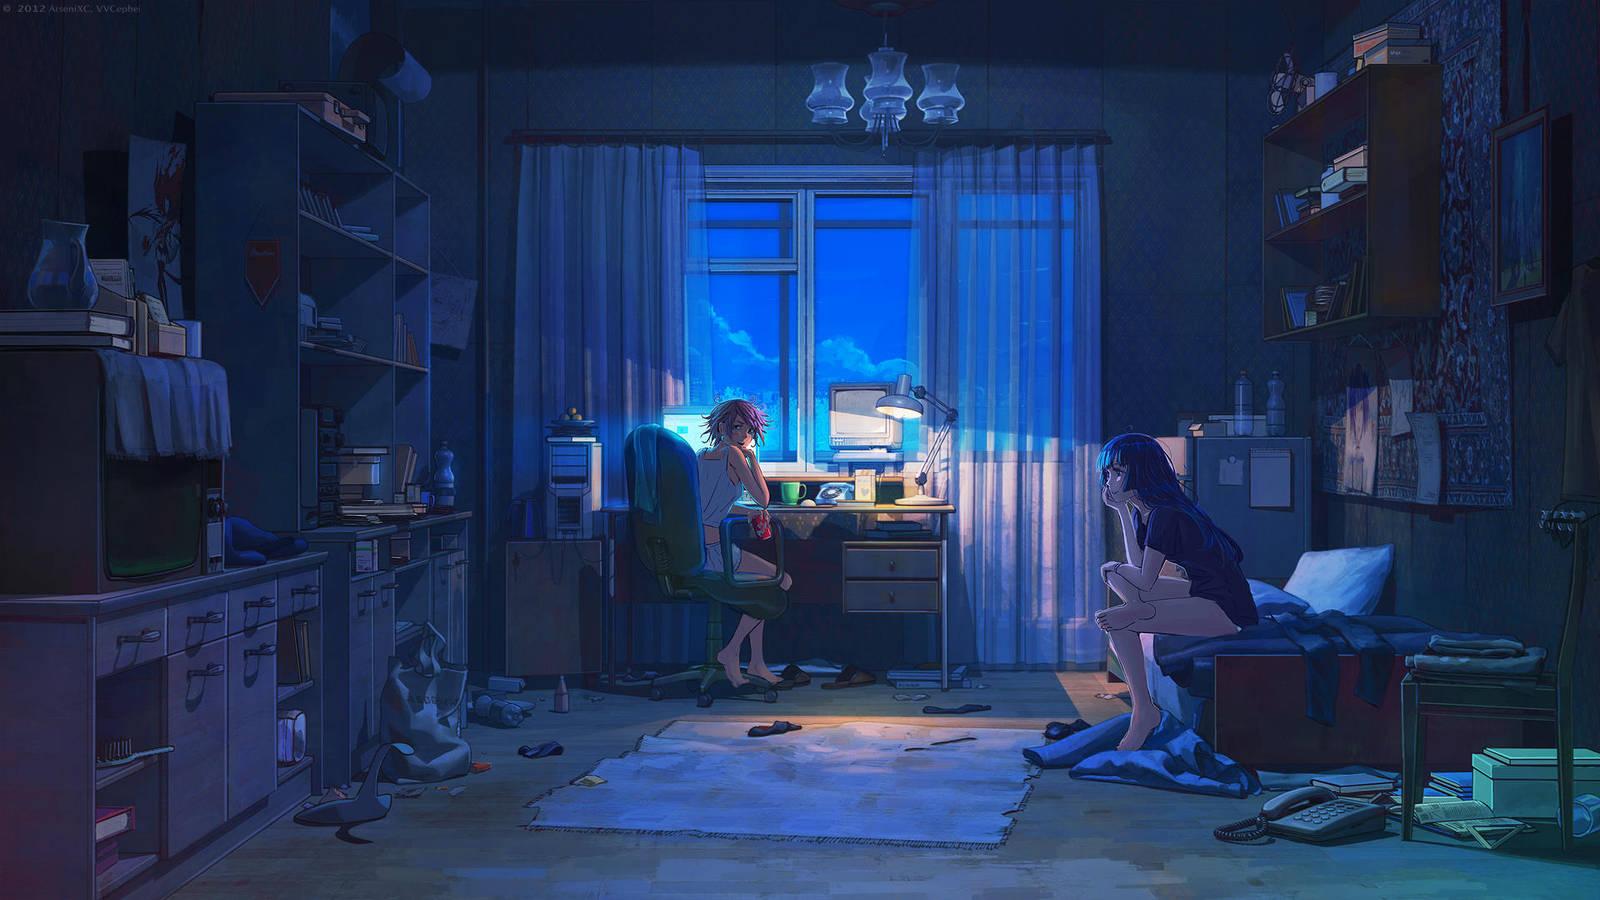 Night talk by arsenixc